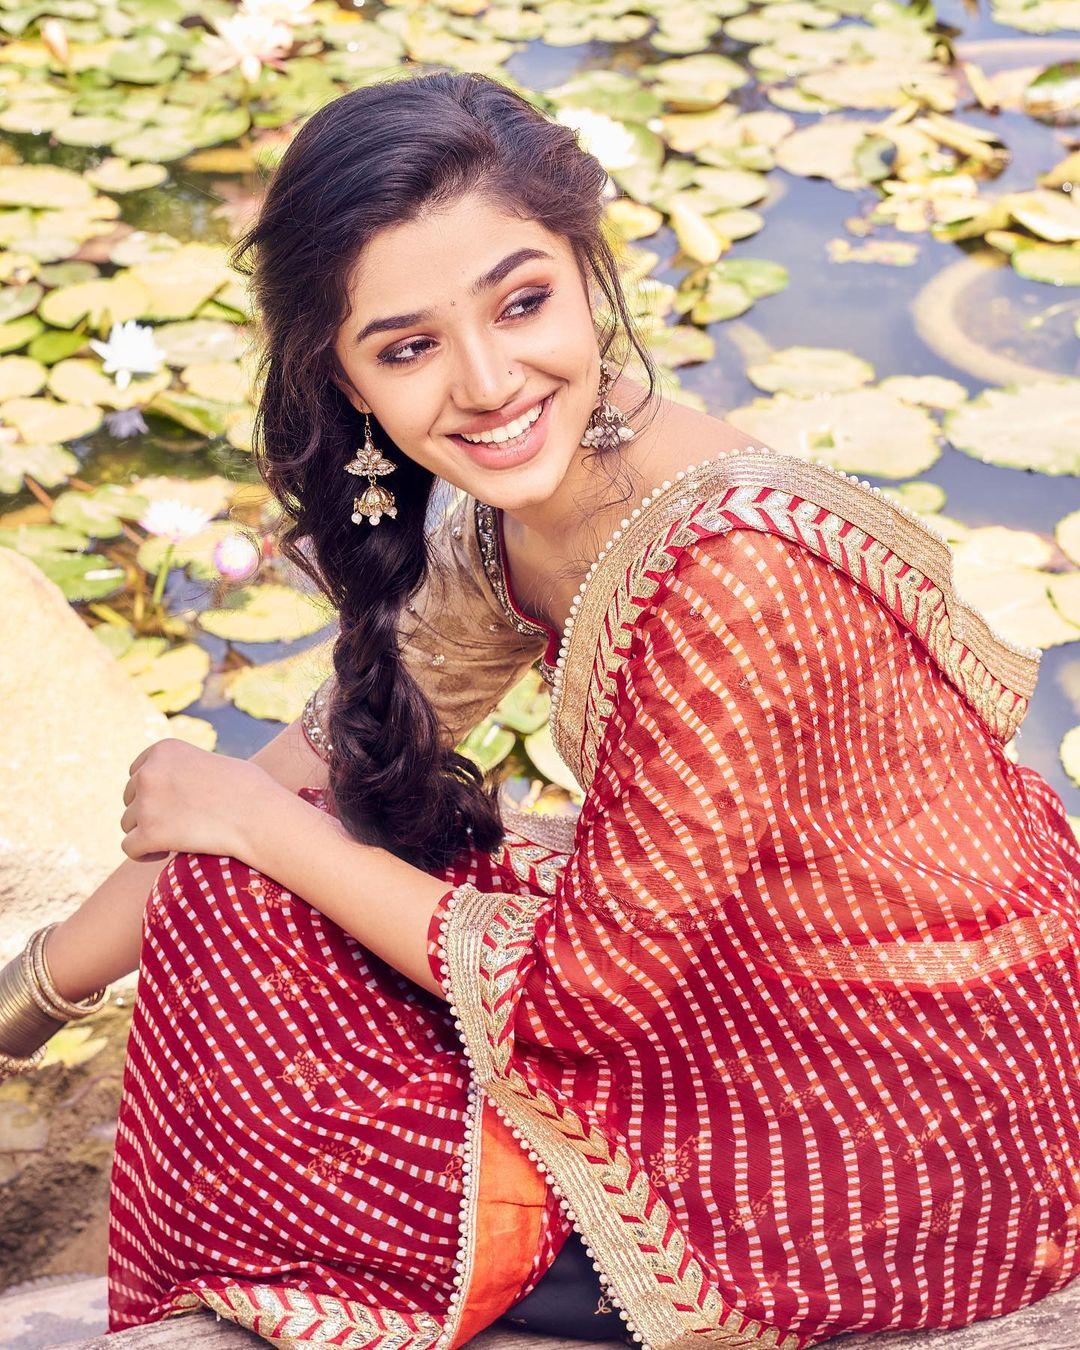 Krithi Shetty: చూపులతో చంపేస్తున్న 'ఉప్పెన' బ్యూటీ కృతి శెట్టి] | News in Telugu